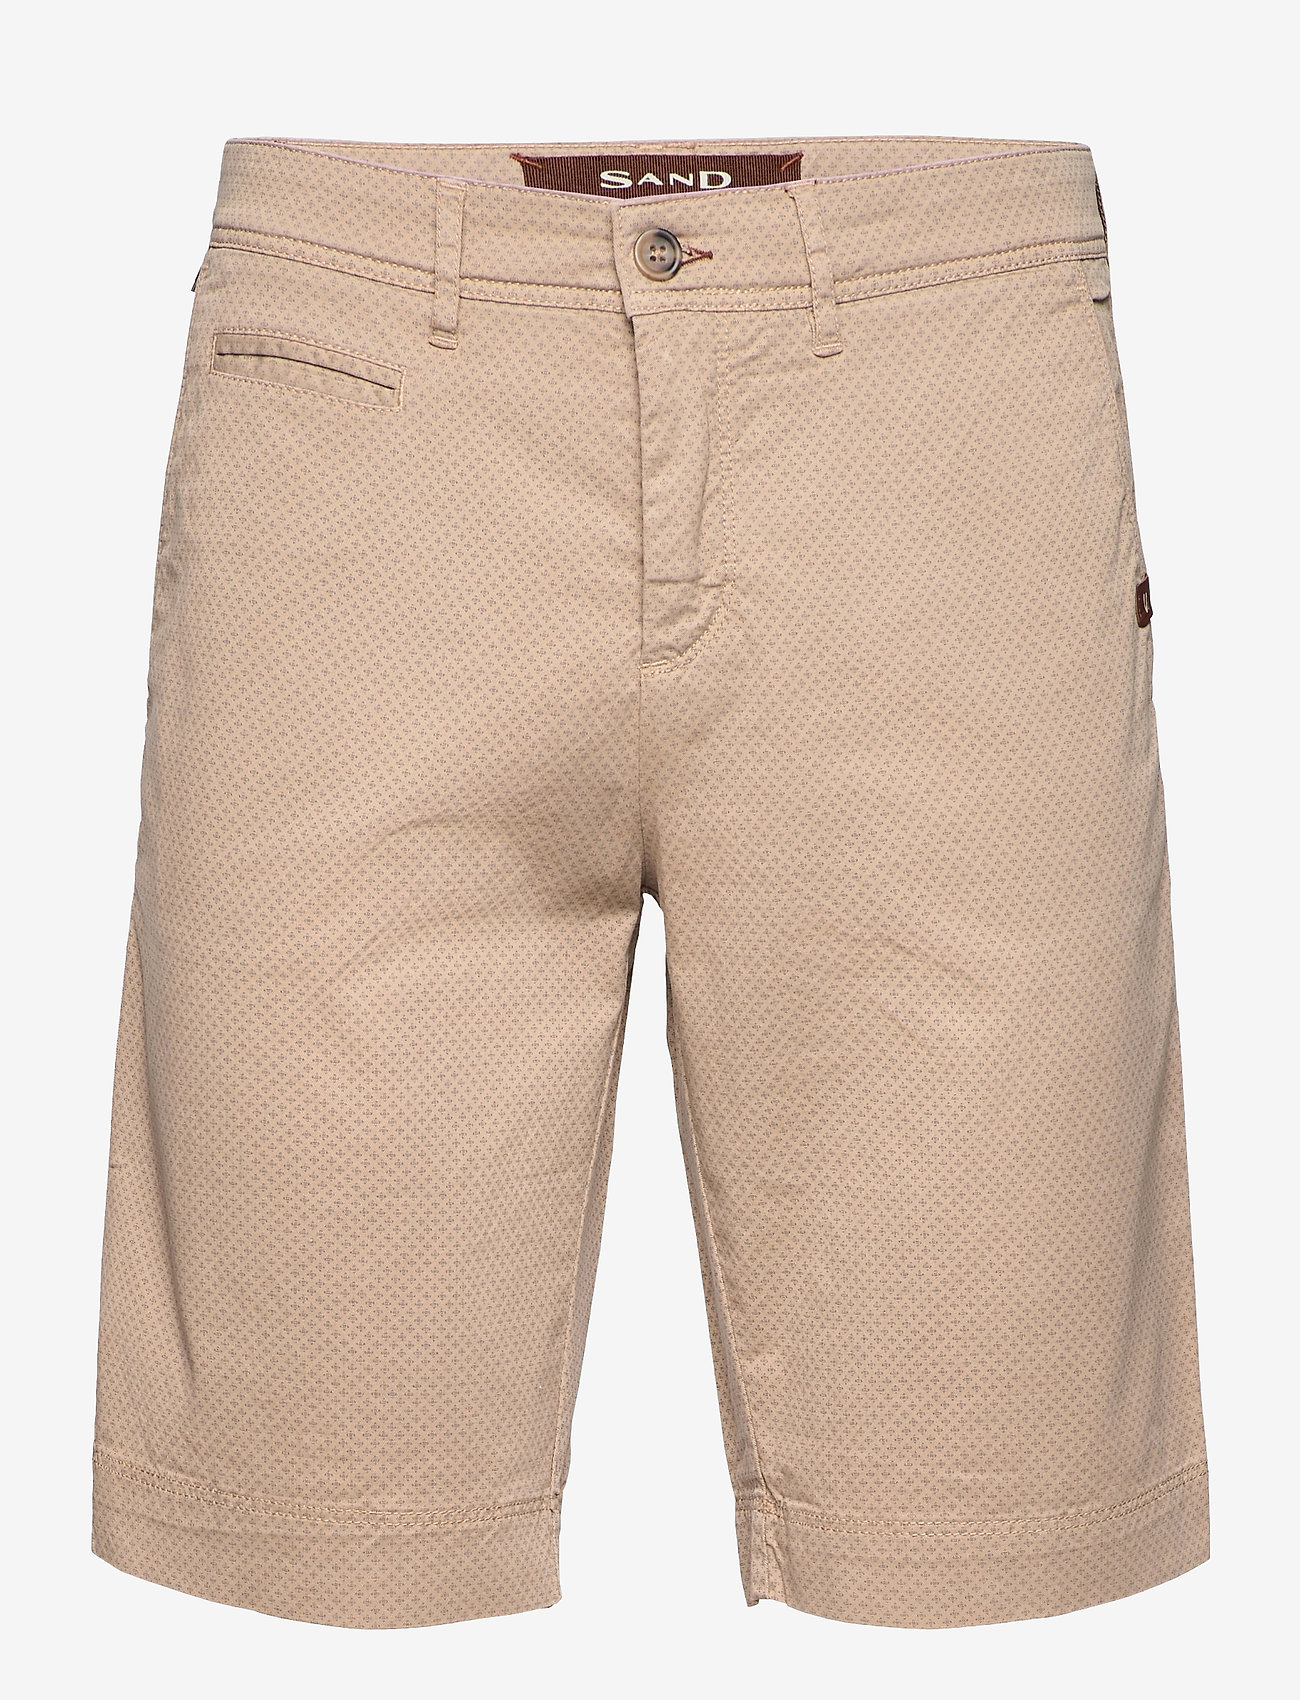 SAND - 2567 - Dolan Short - chino's shorts - light camel - 0